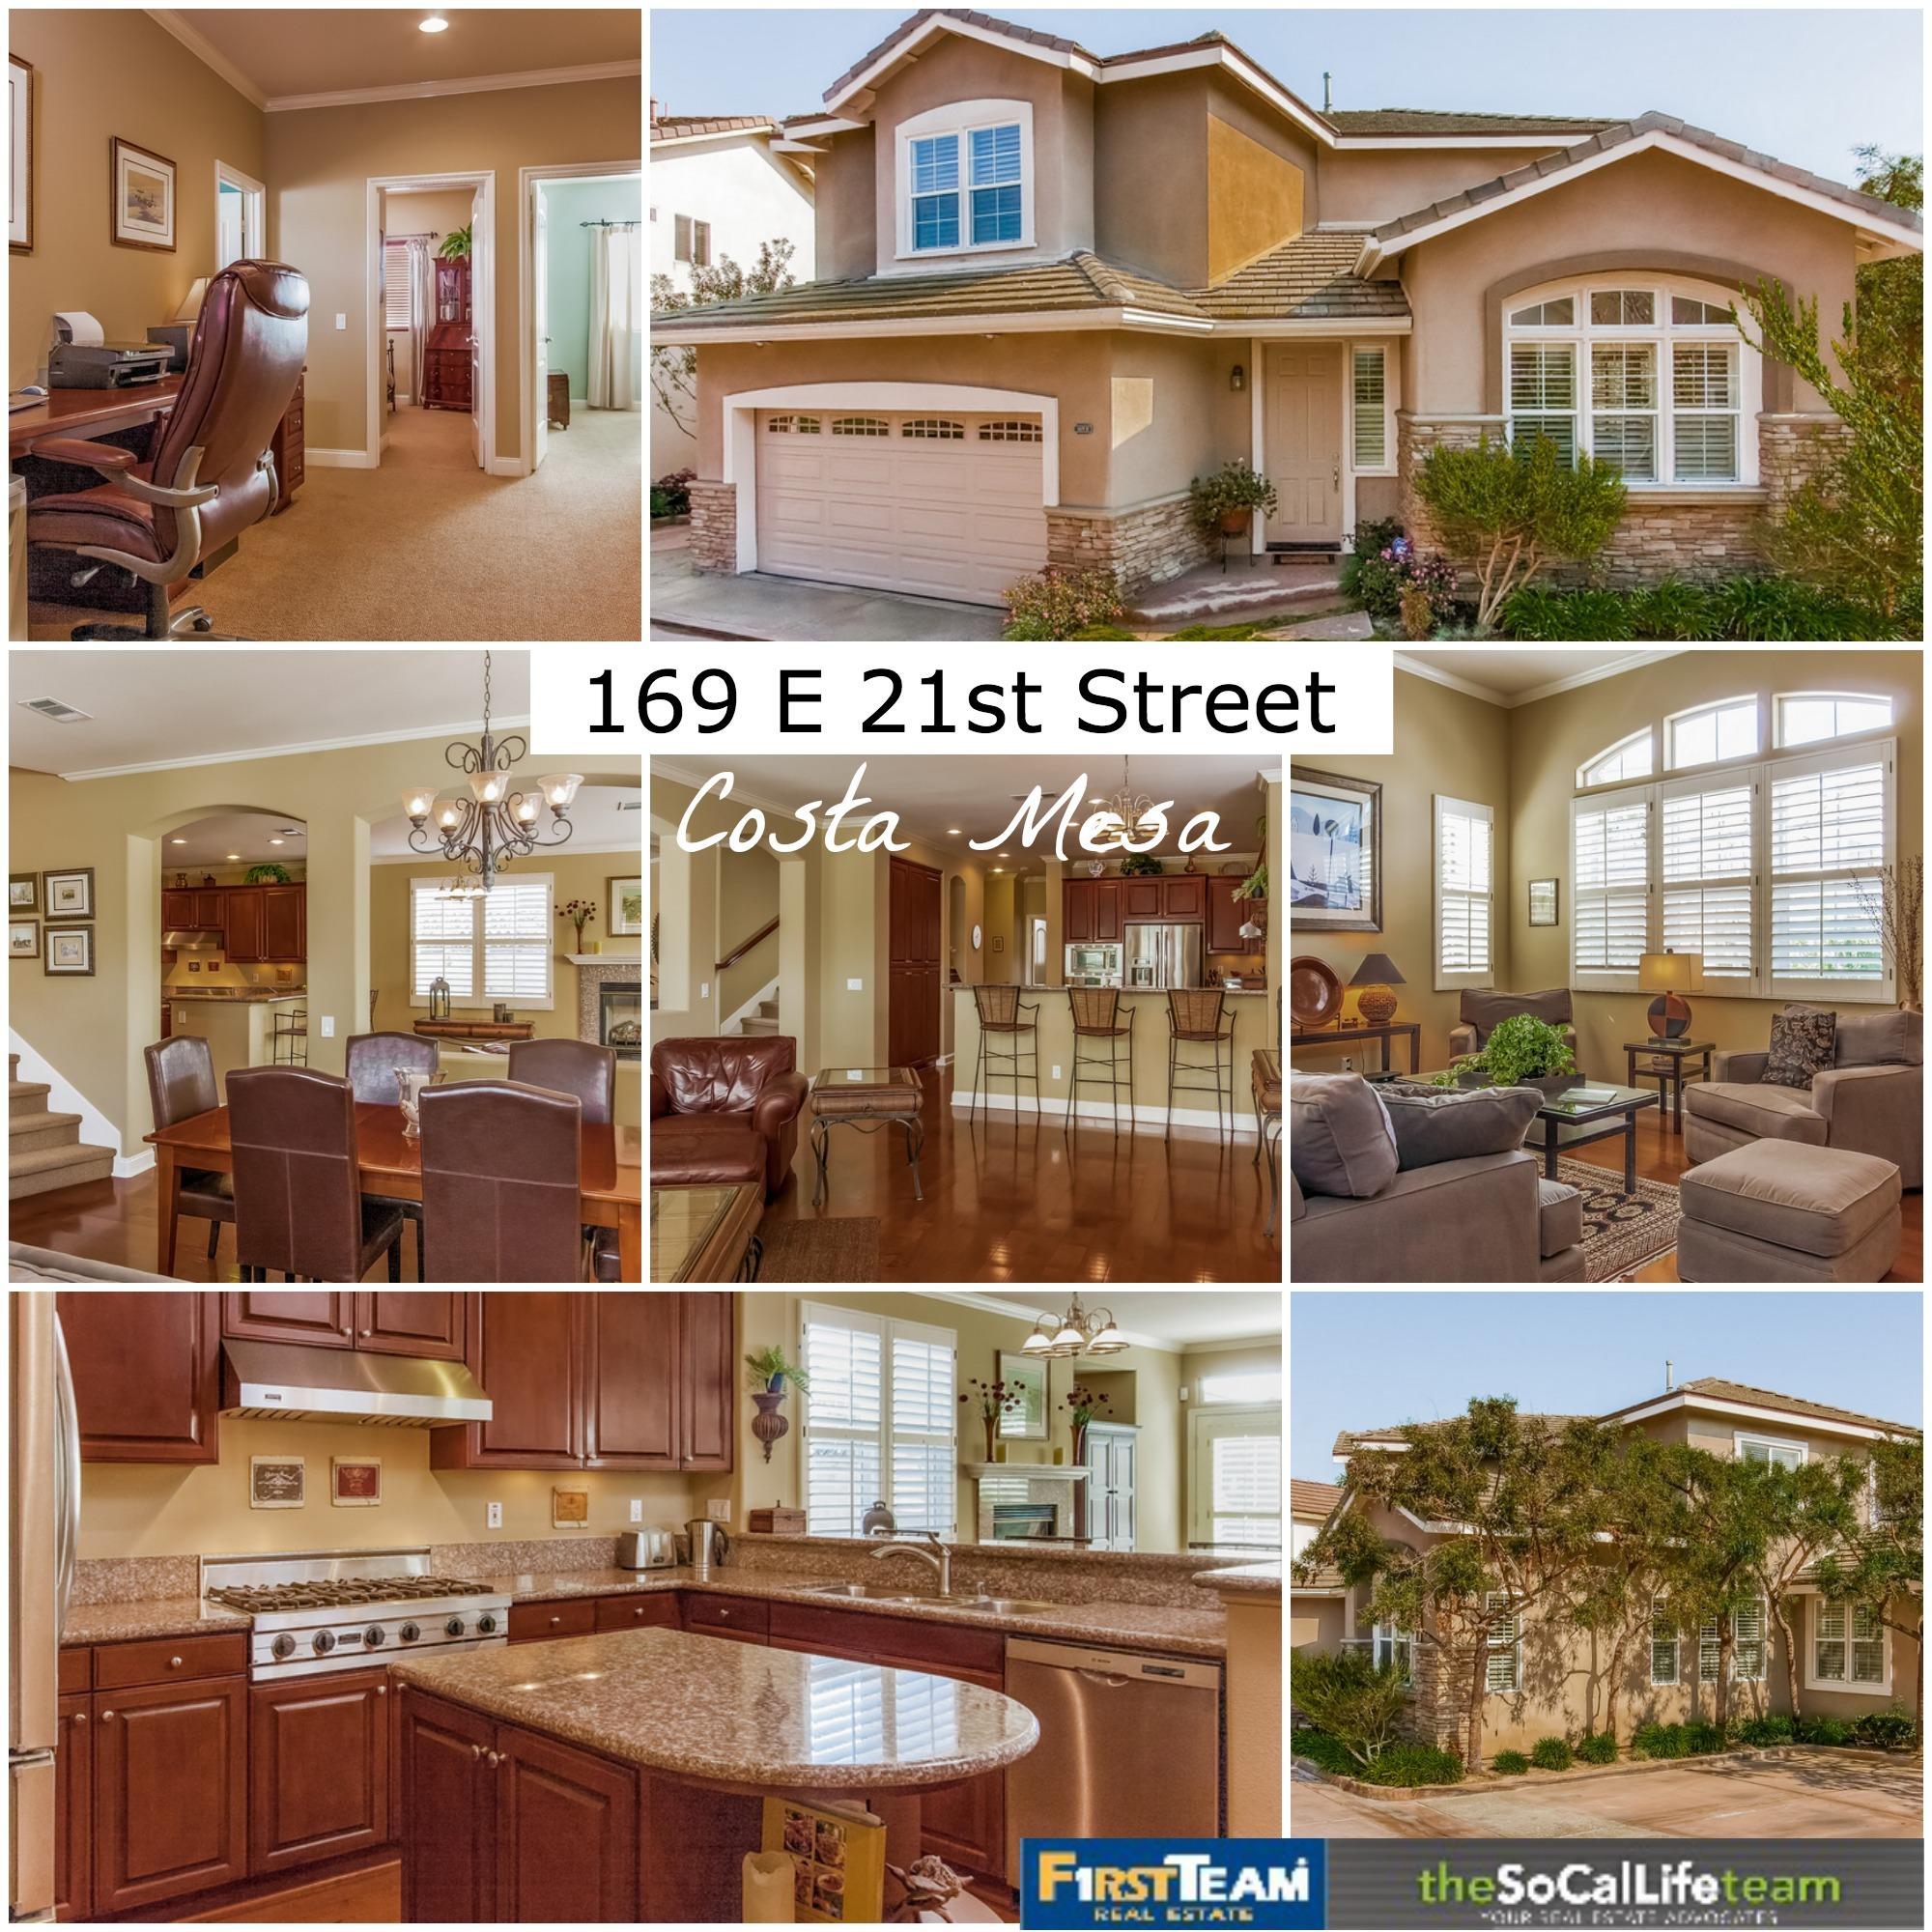 The Living Room Costa Mesa Yelp: Home For Sale In Costa Mesa: H 169 E 21st Street E